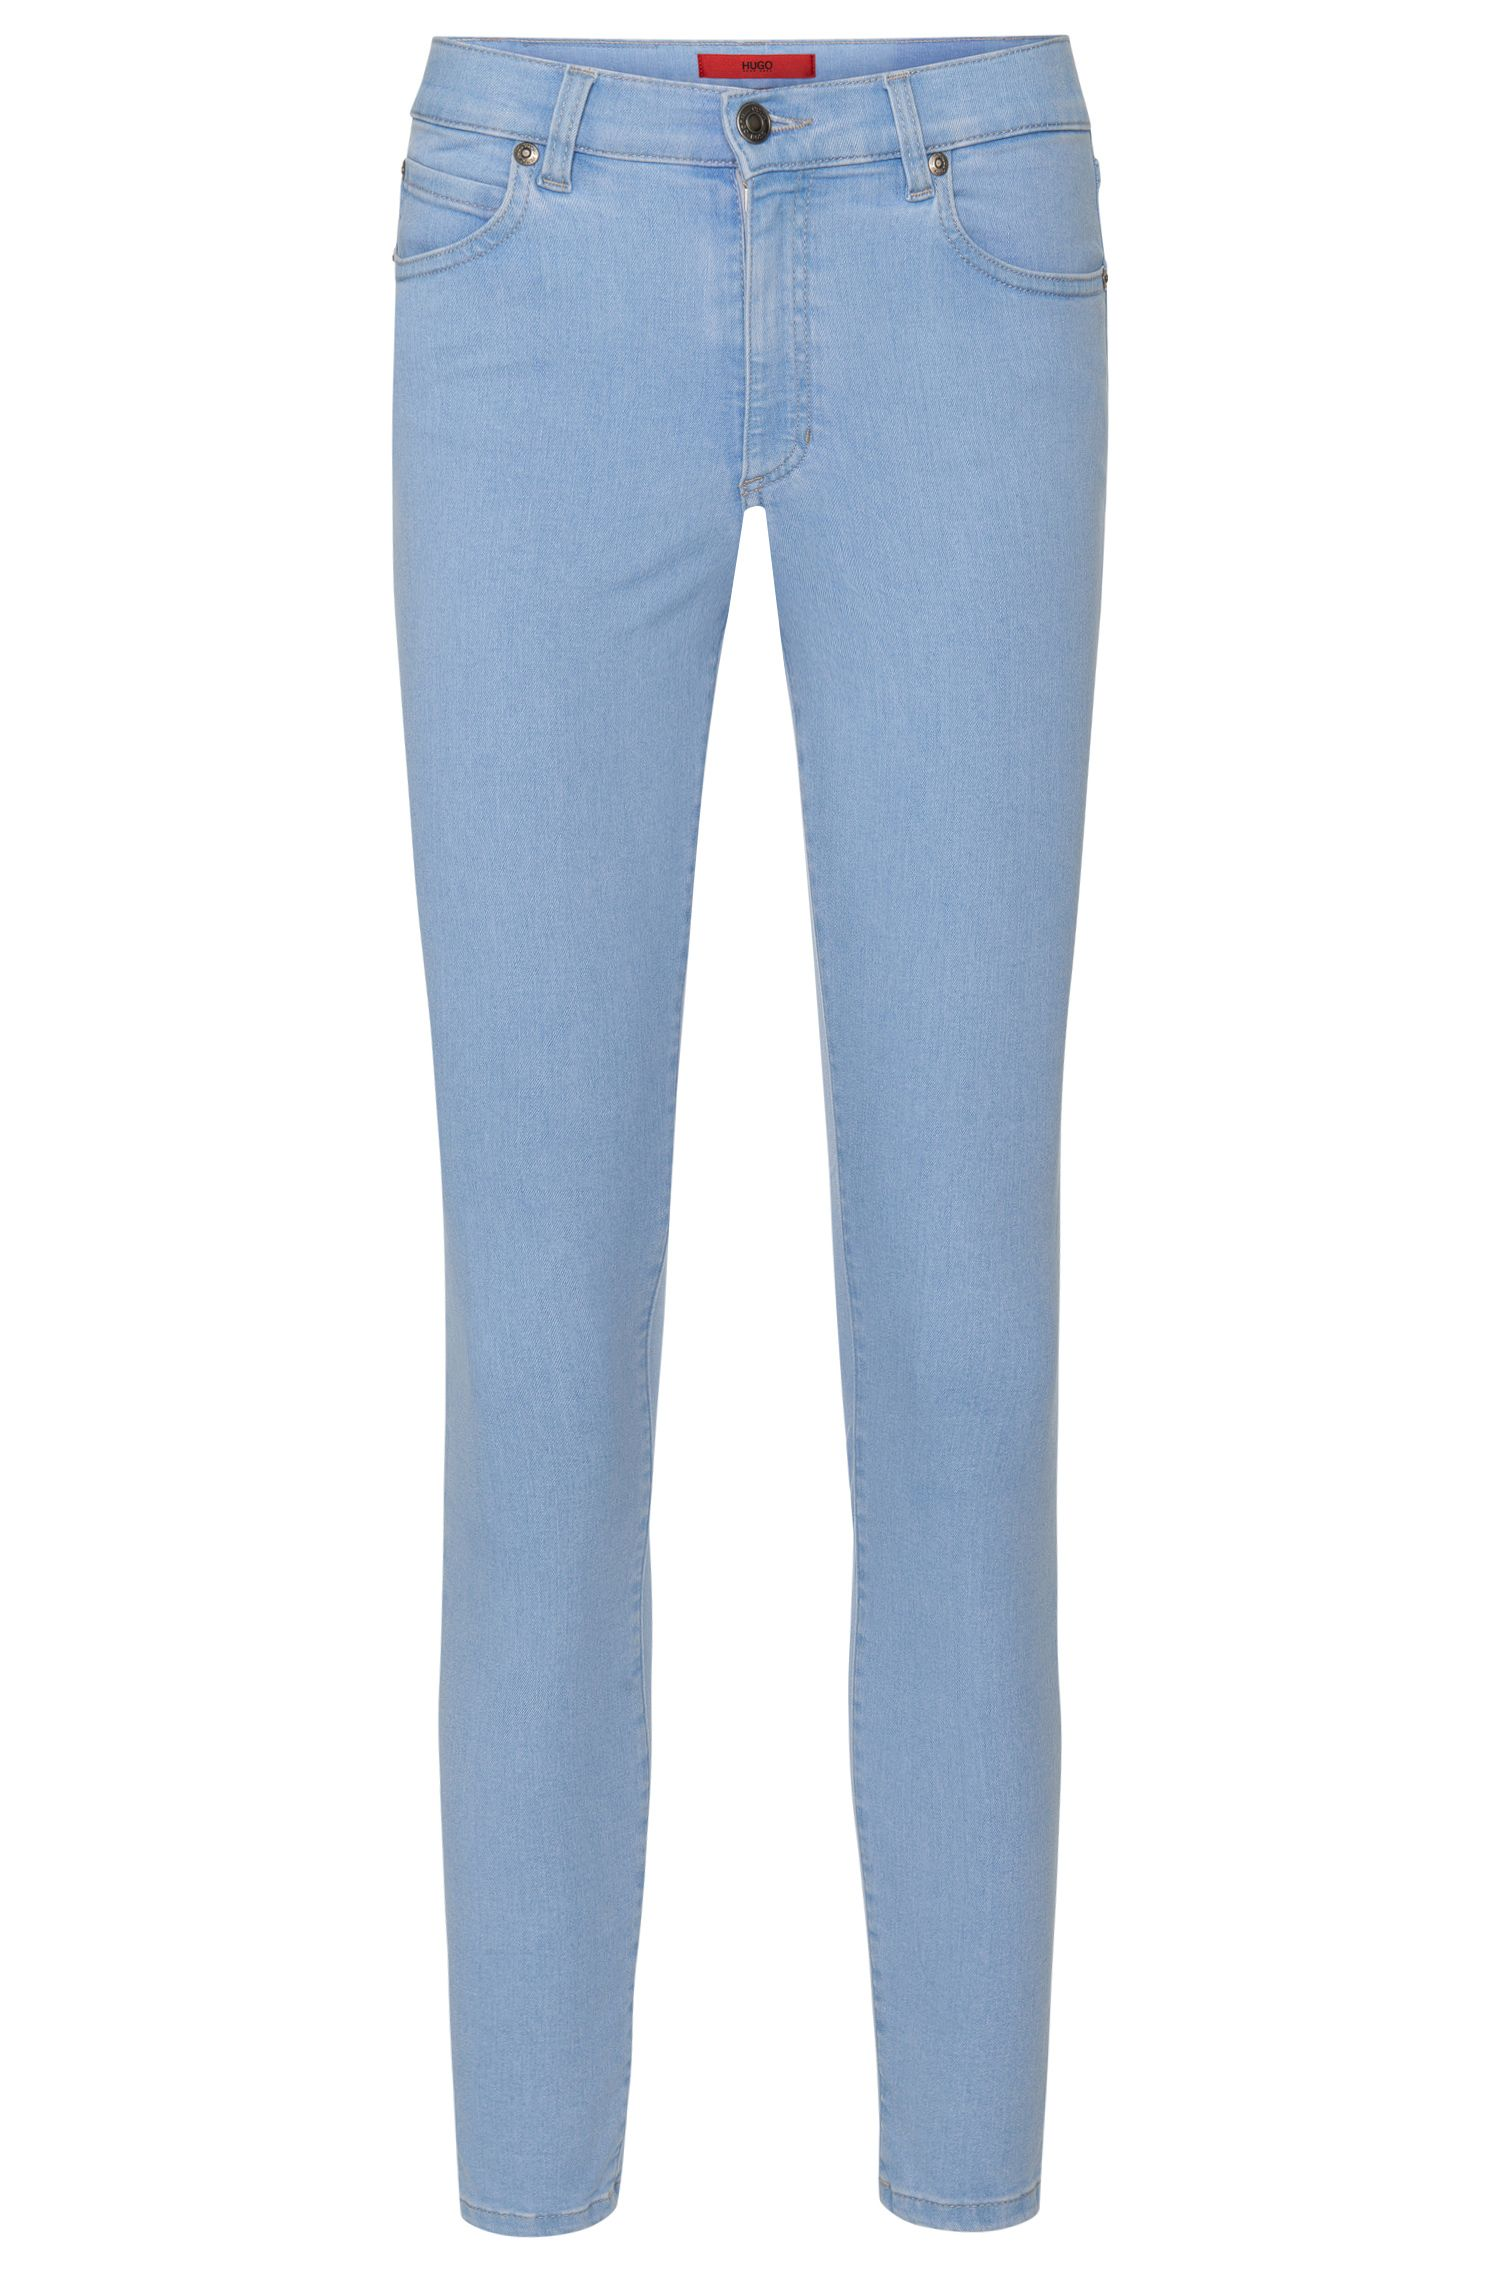 Jeans SkinnyFit en coton extensible mélangé: «Gerna Highwaist Skinny Leg»